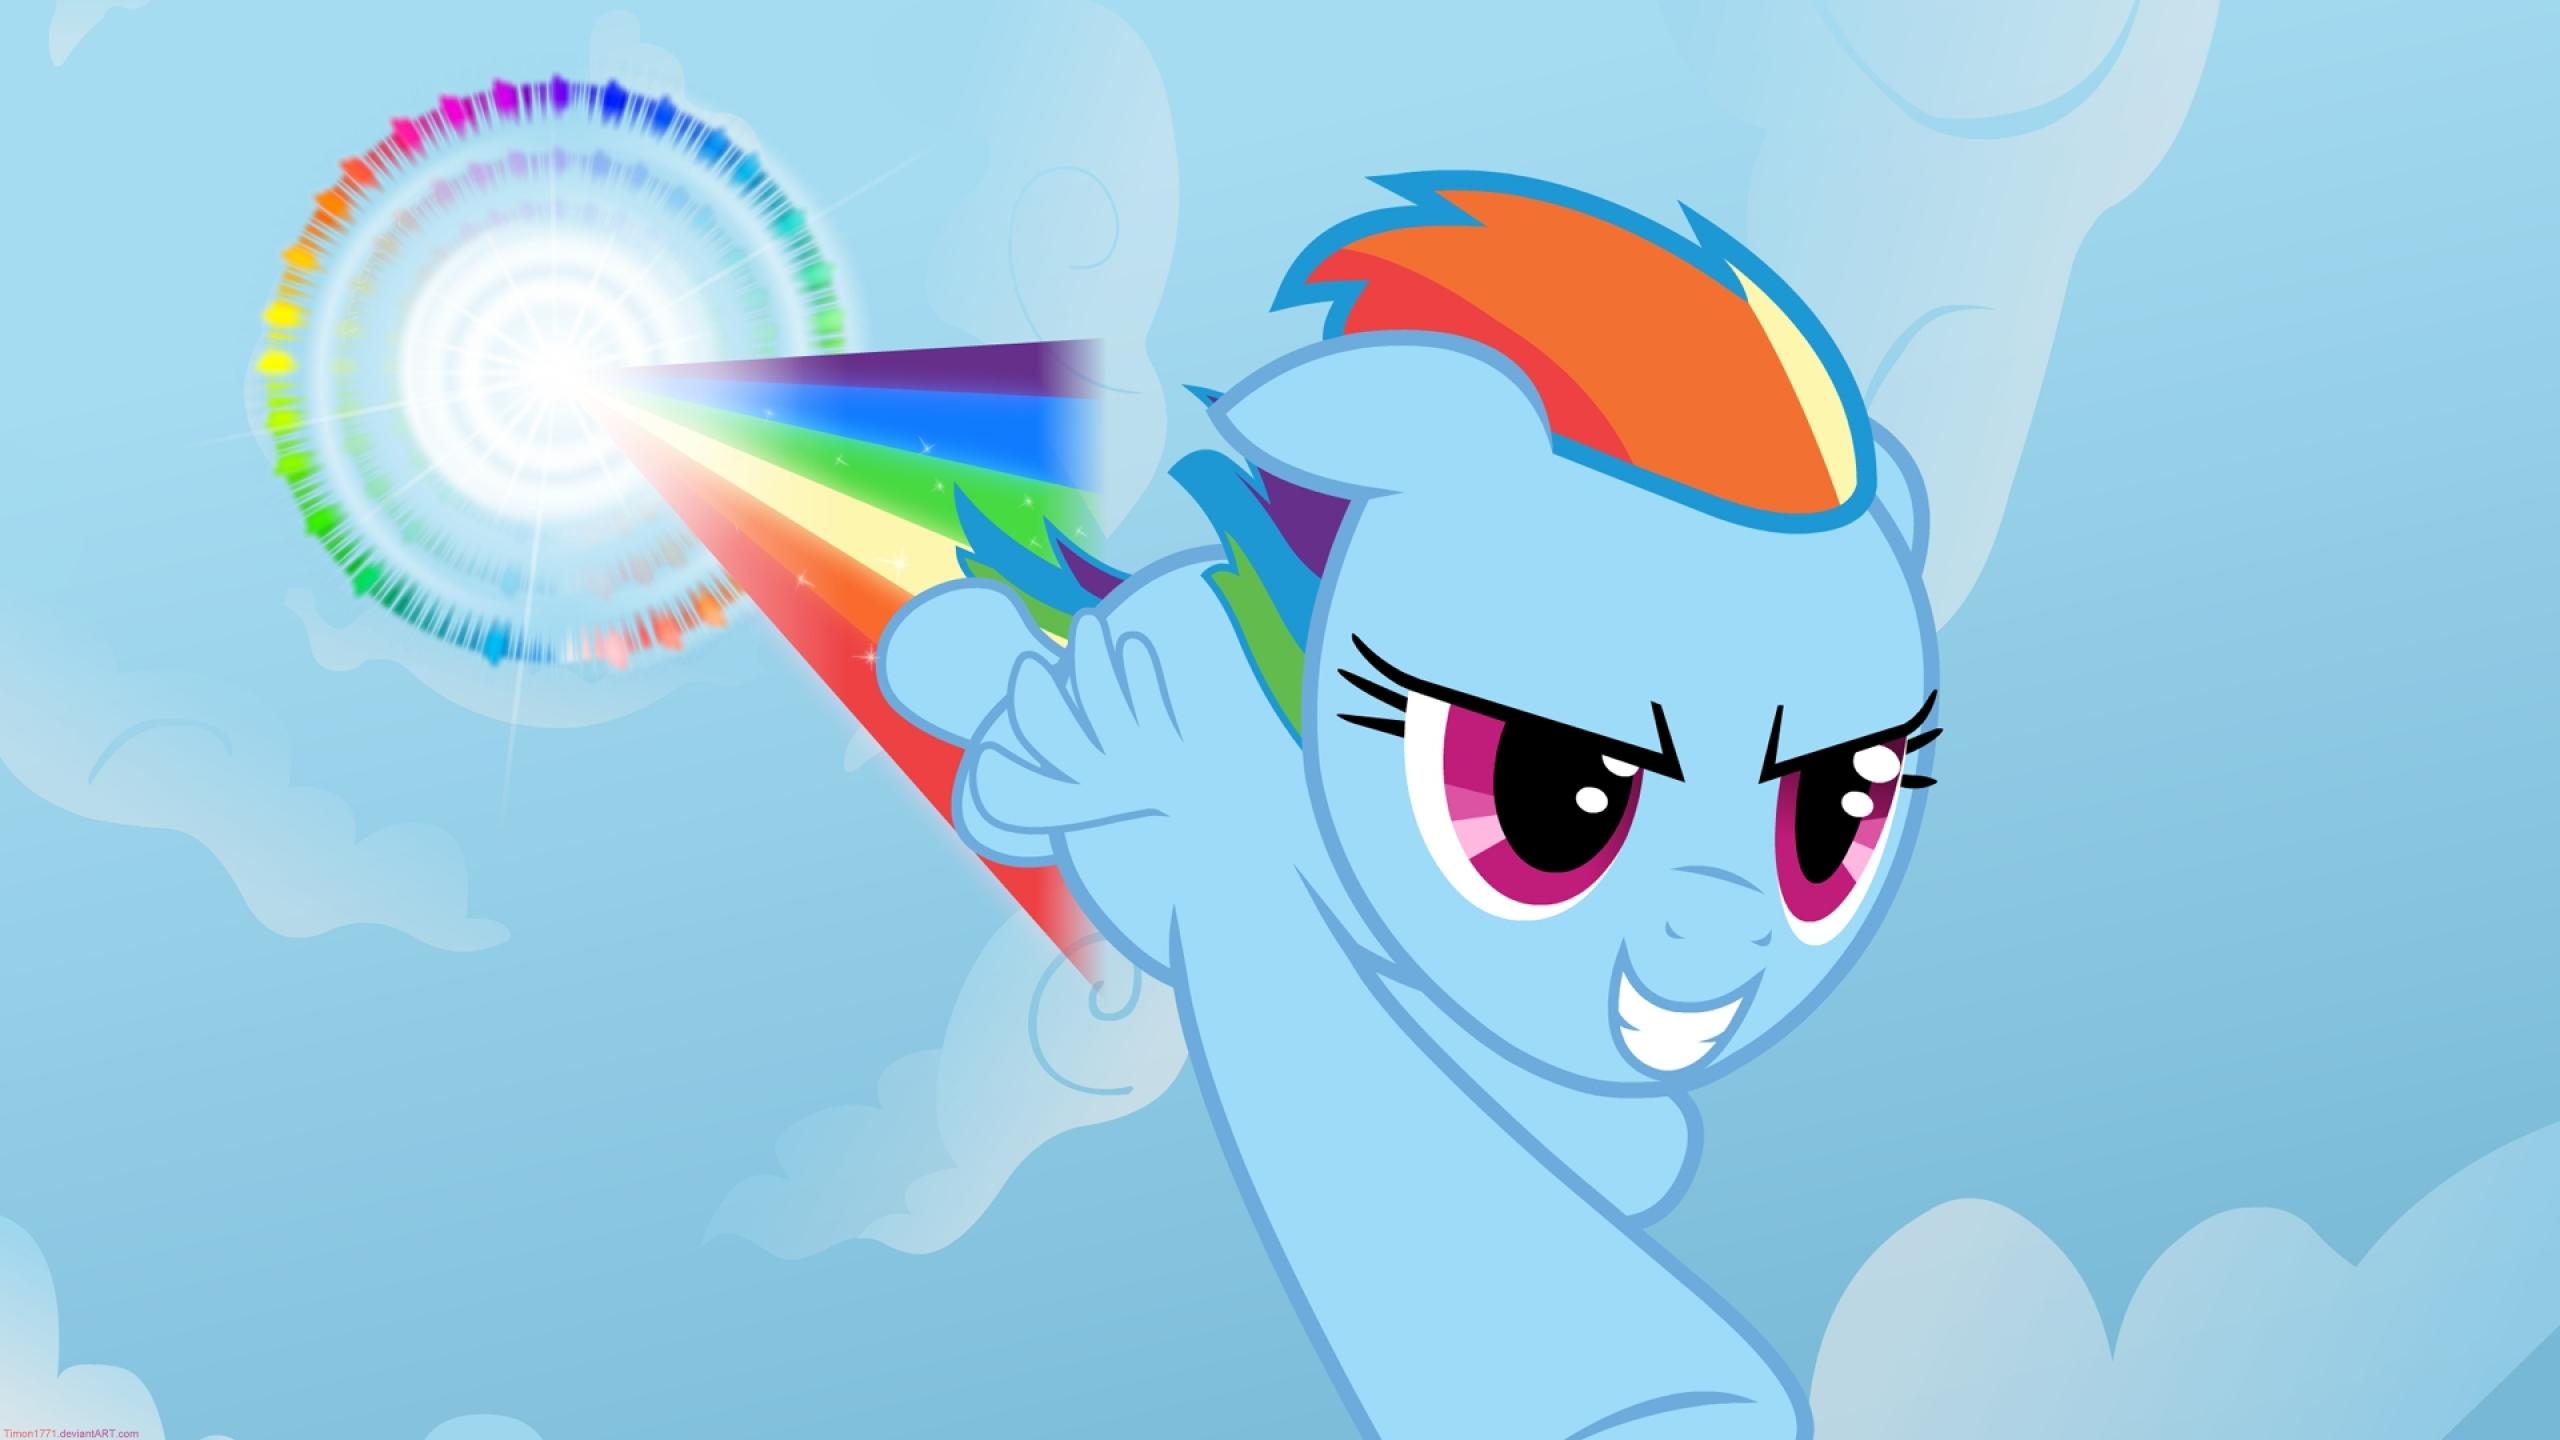 rainbow dash sonic rainboom 1920x1080 wallpaper Wallpaper 2560x1440